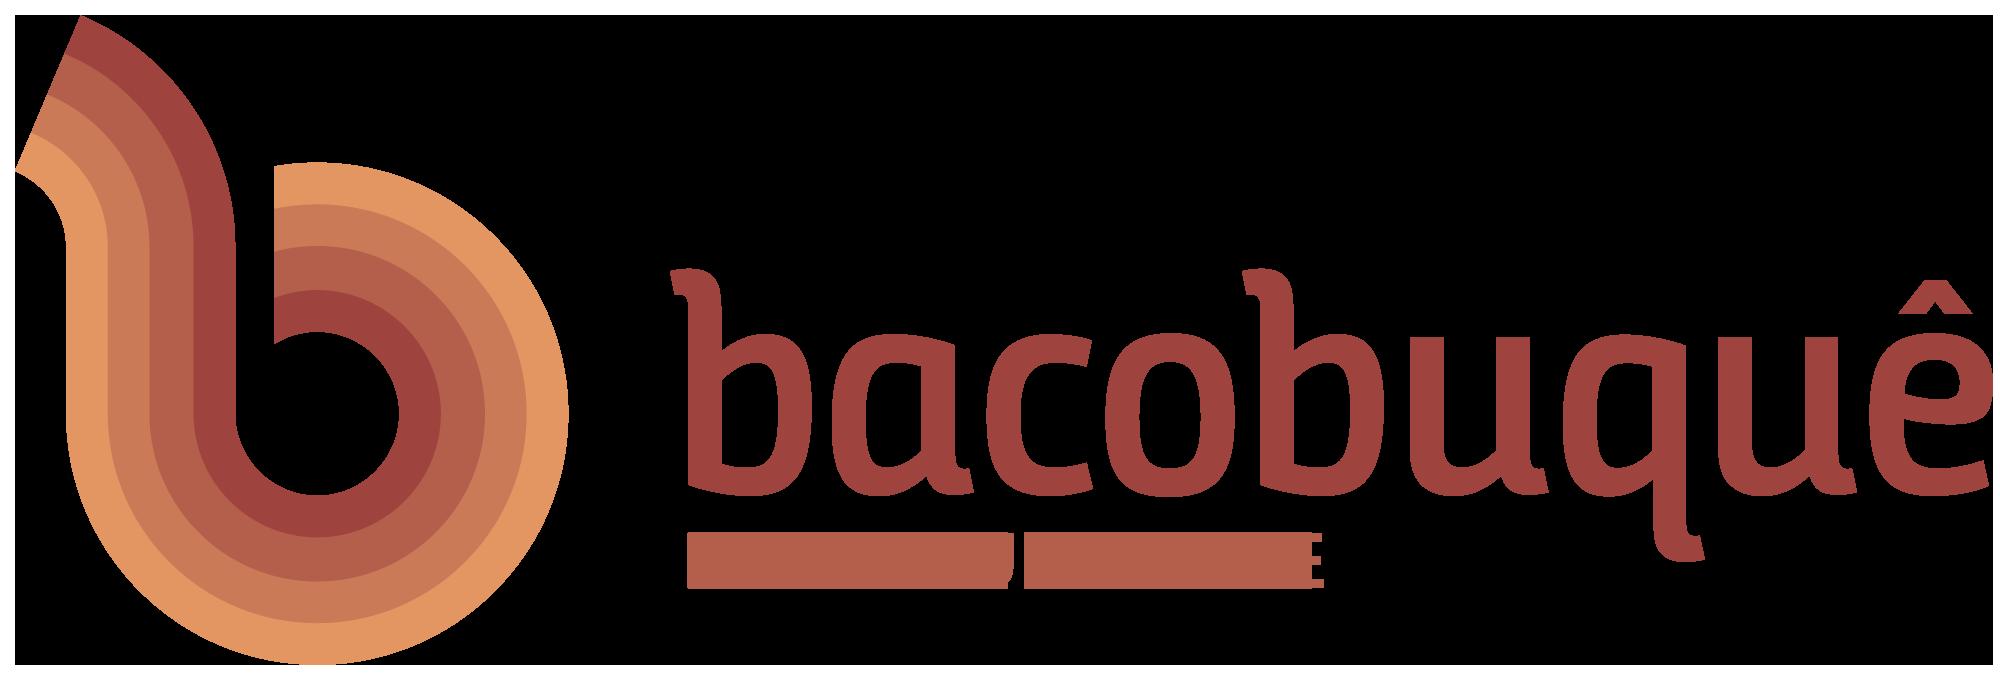 bb-restaurante-color